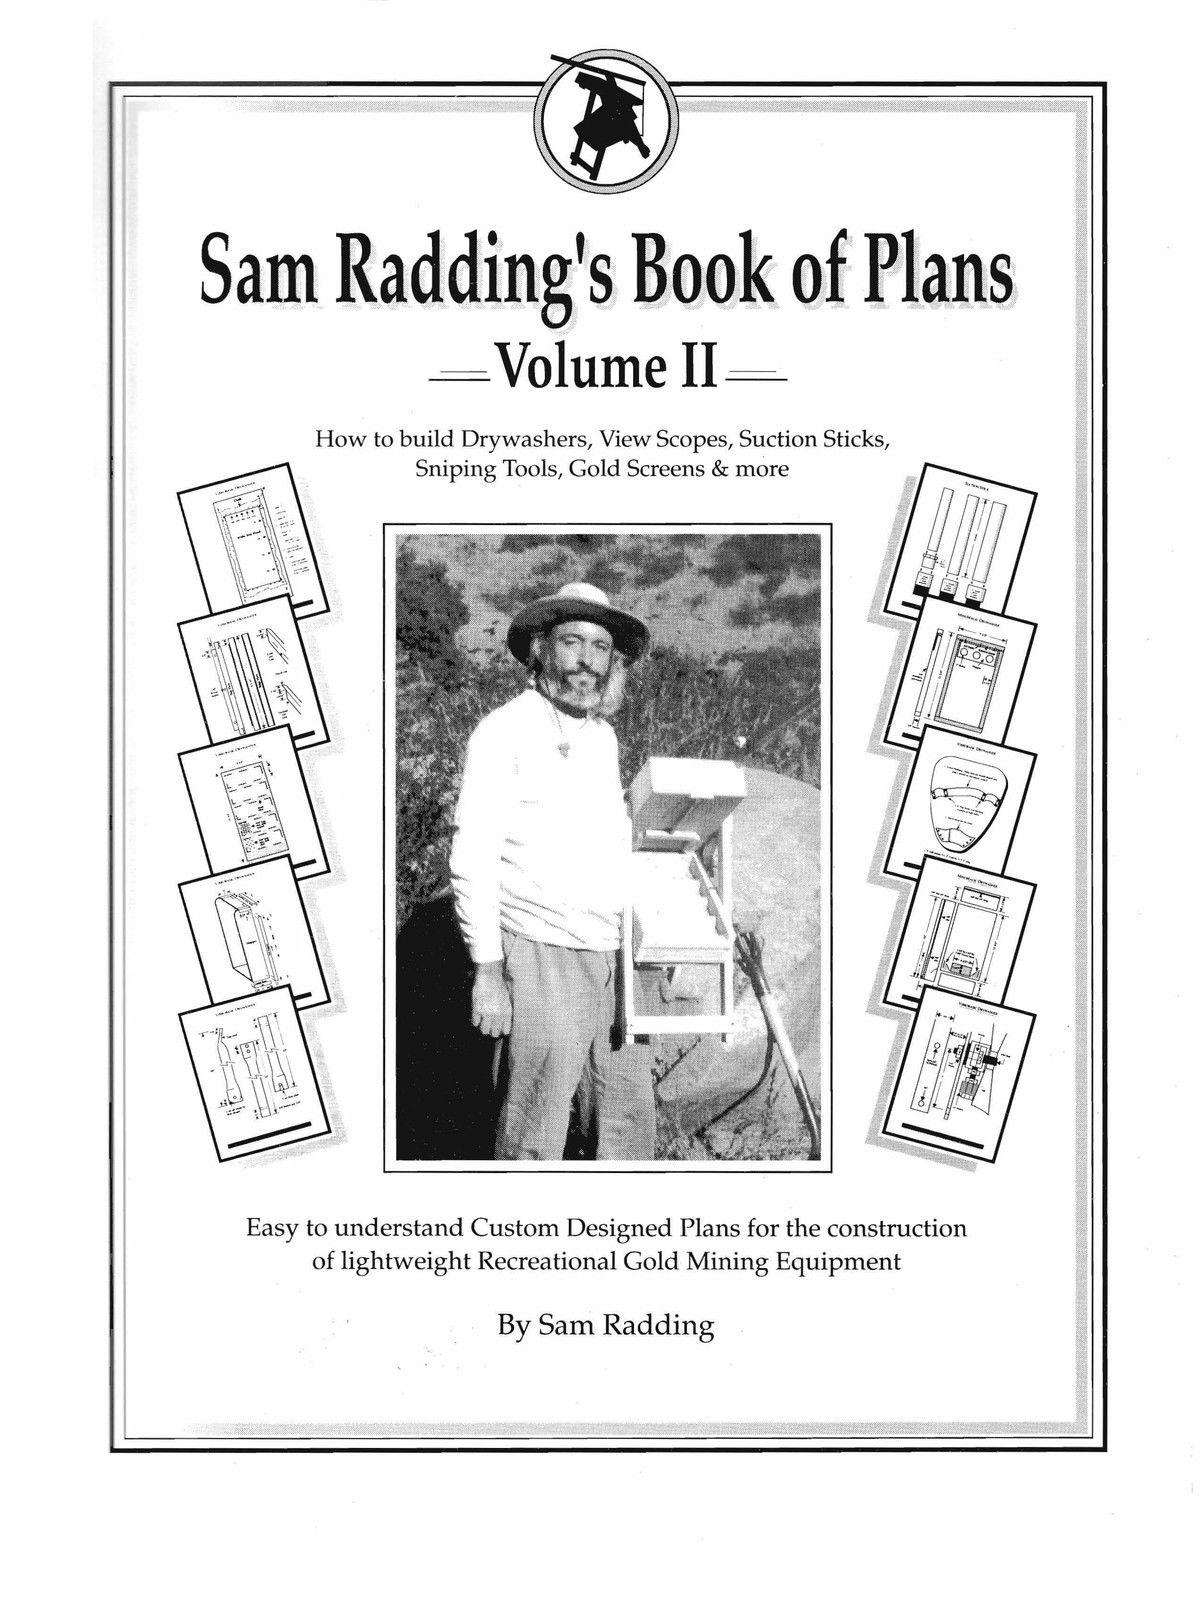 Sam Radding's Book of Plans – Vol II